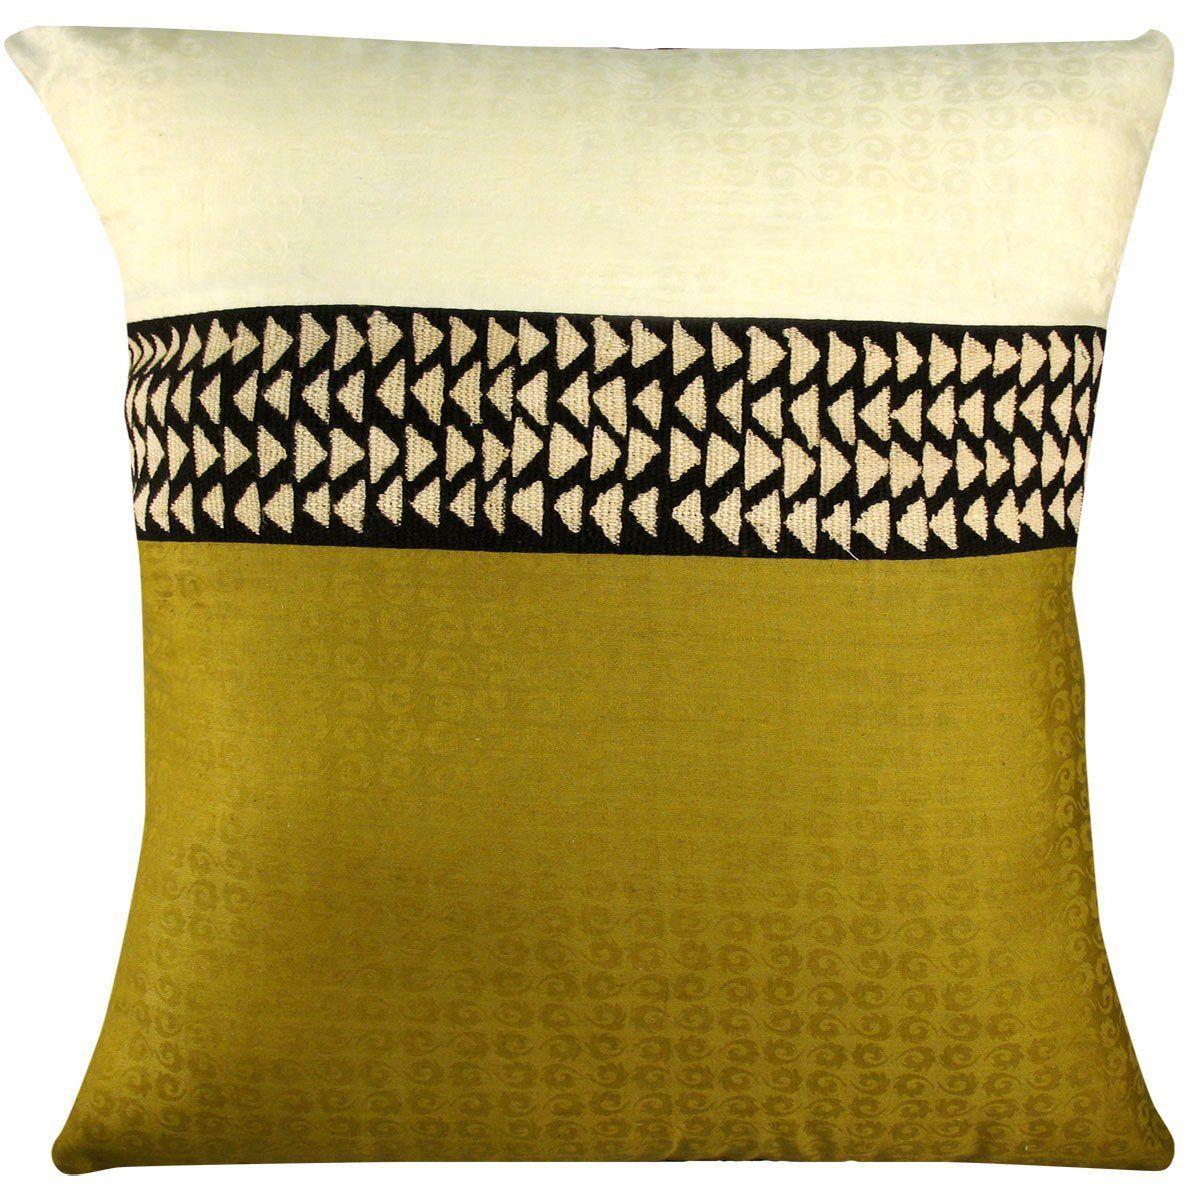 Amazon.com: African Cream and Sage Mudcloth Throw Pillow ...